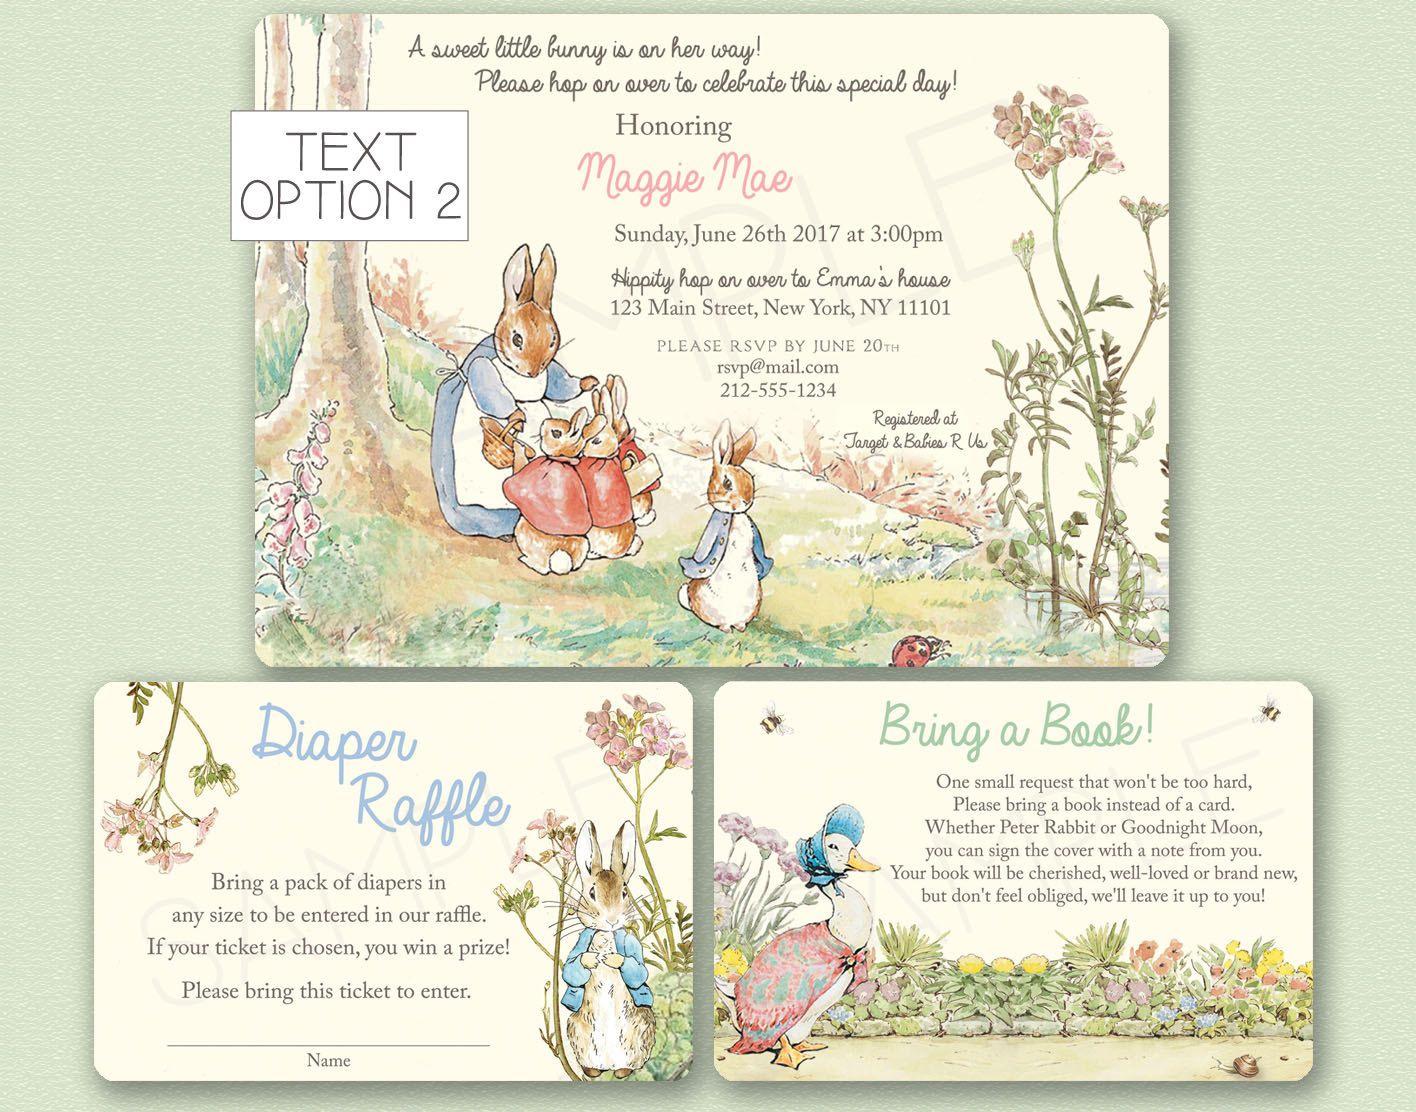 Peter Rabbit Baby Shower Invitation - Beatrix Potter Birthday Party ...